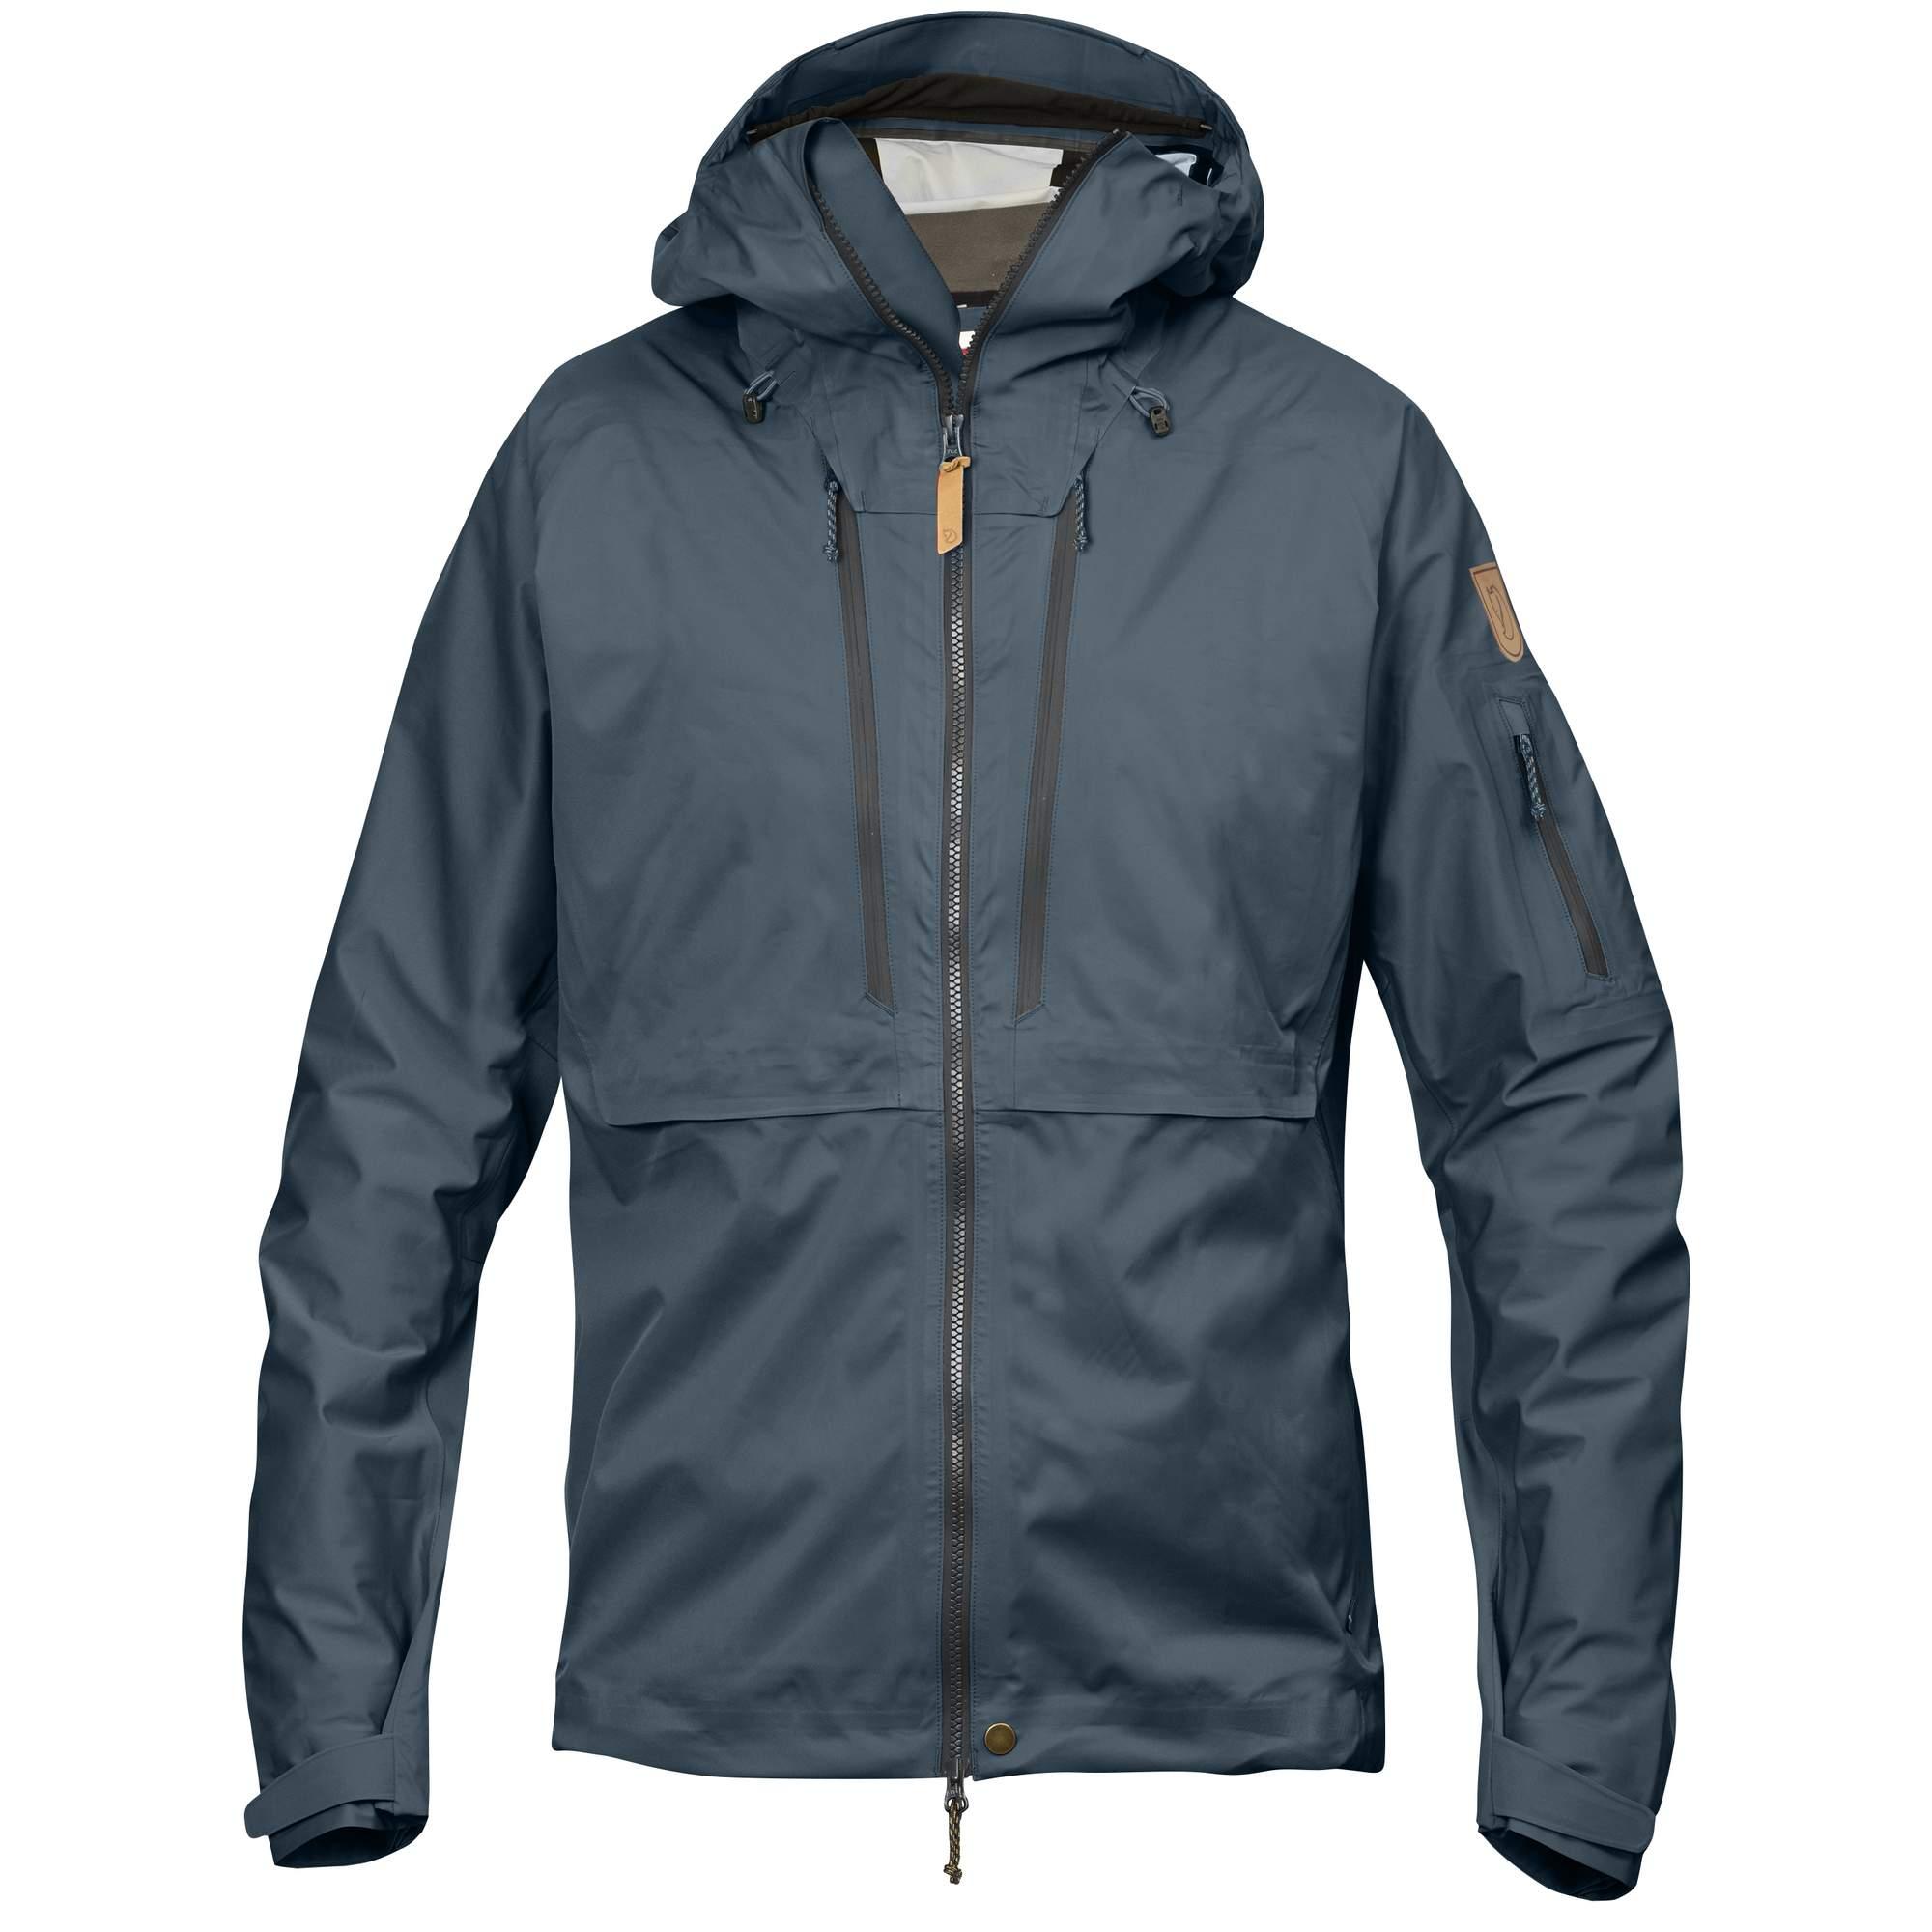 Fjallraven Keb Eco-Shell Jacket - Dusk